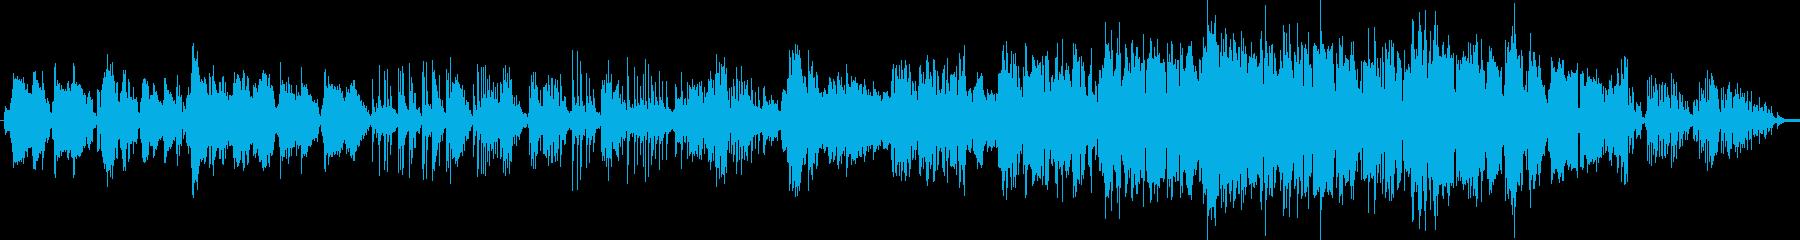 Regenerationの再生済みの波形